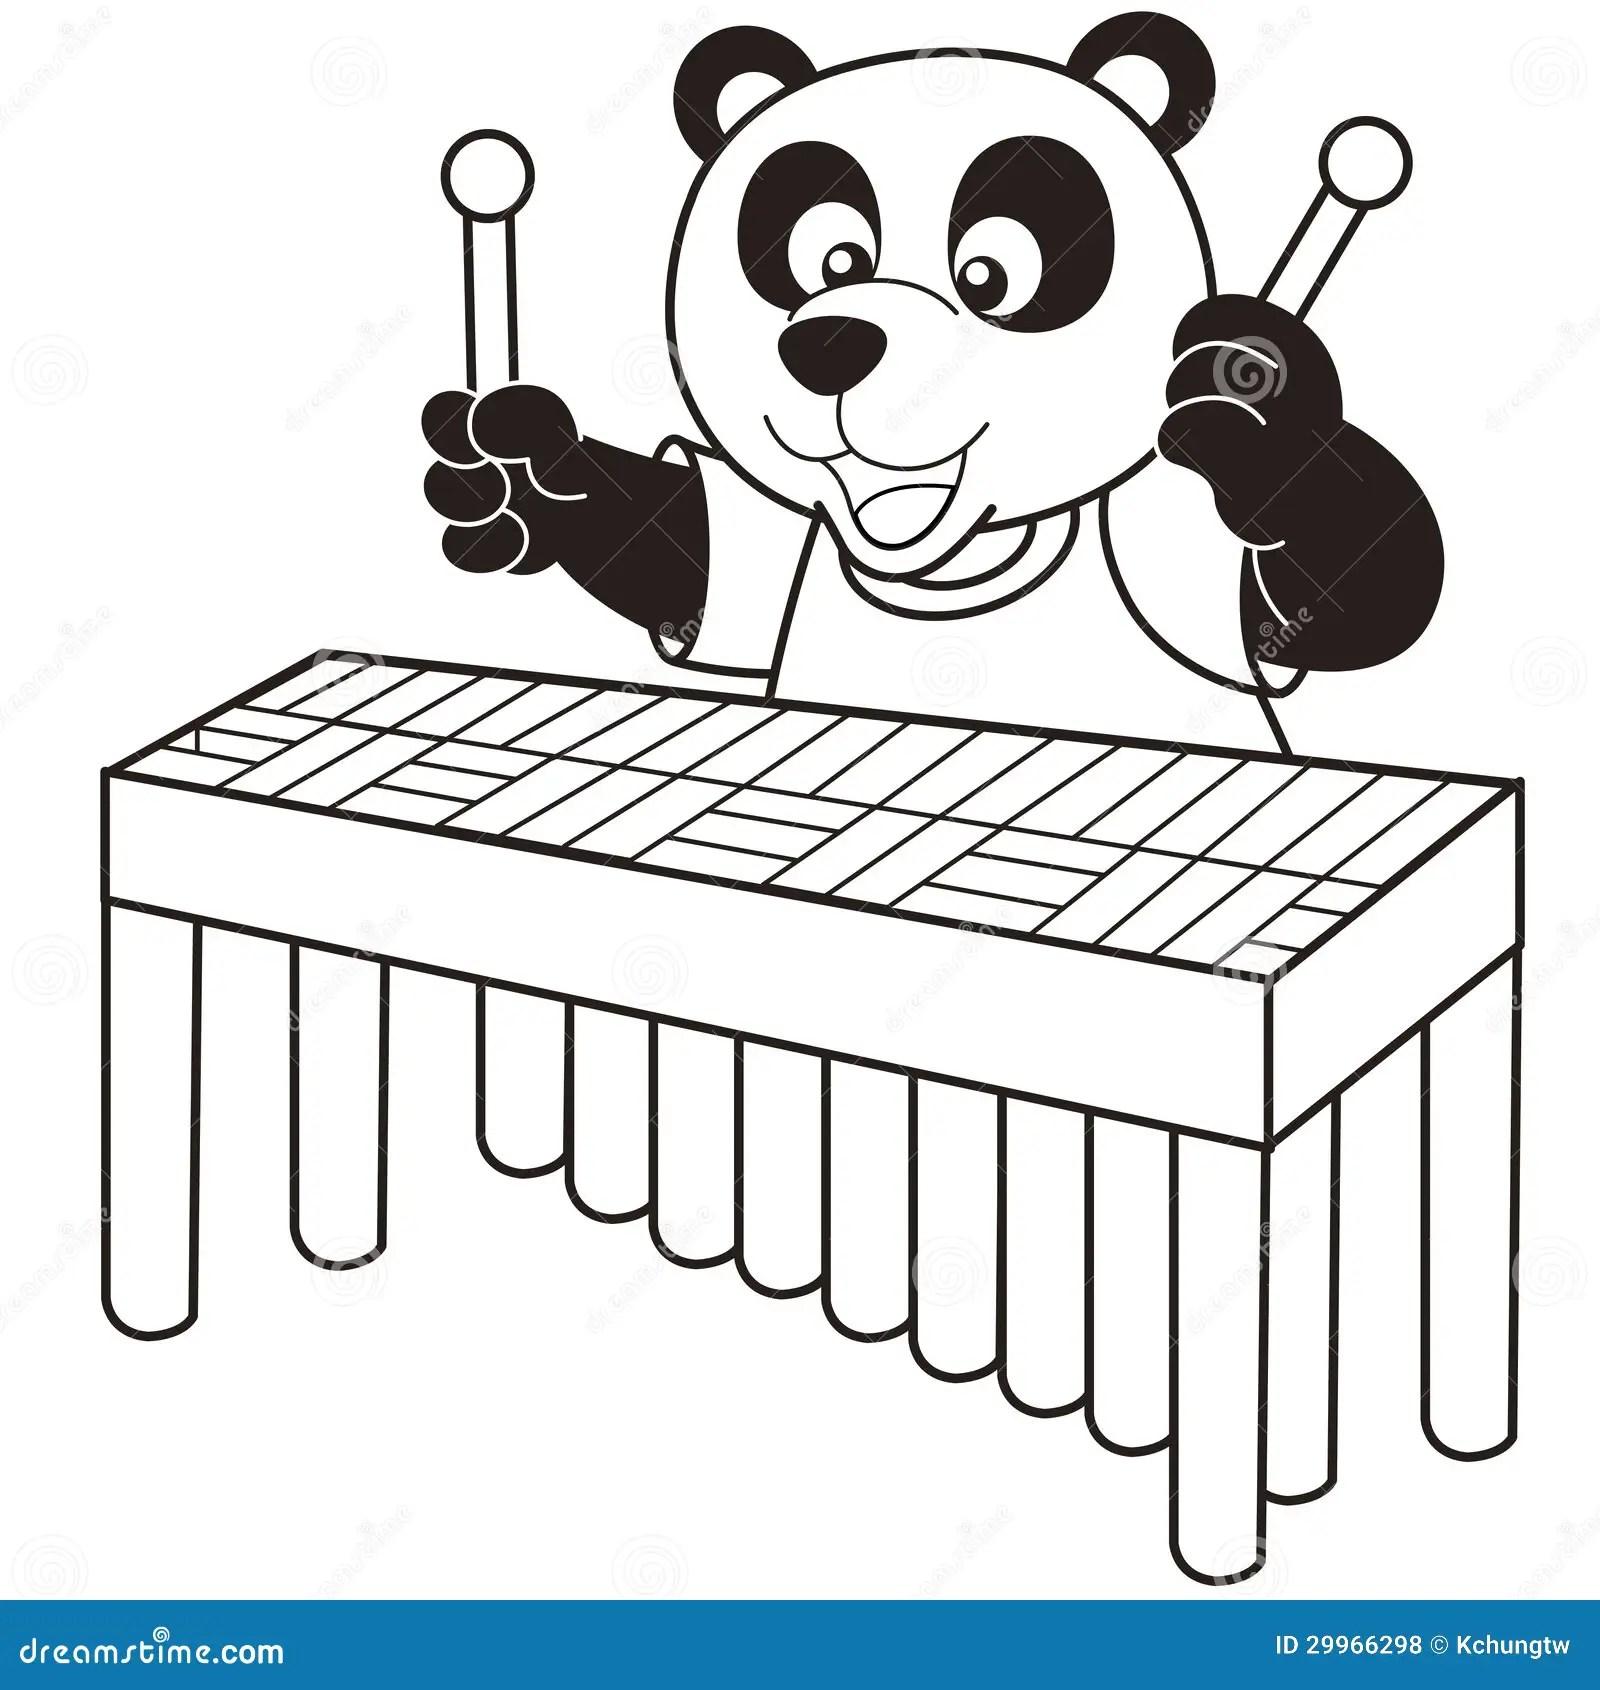 Cartoon Panda Playing A Vibraphone Royalty Free Stock